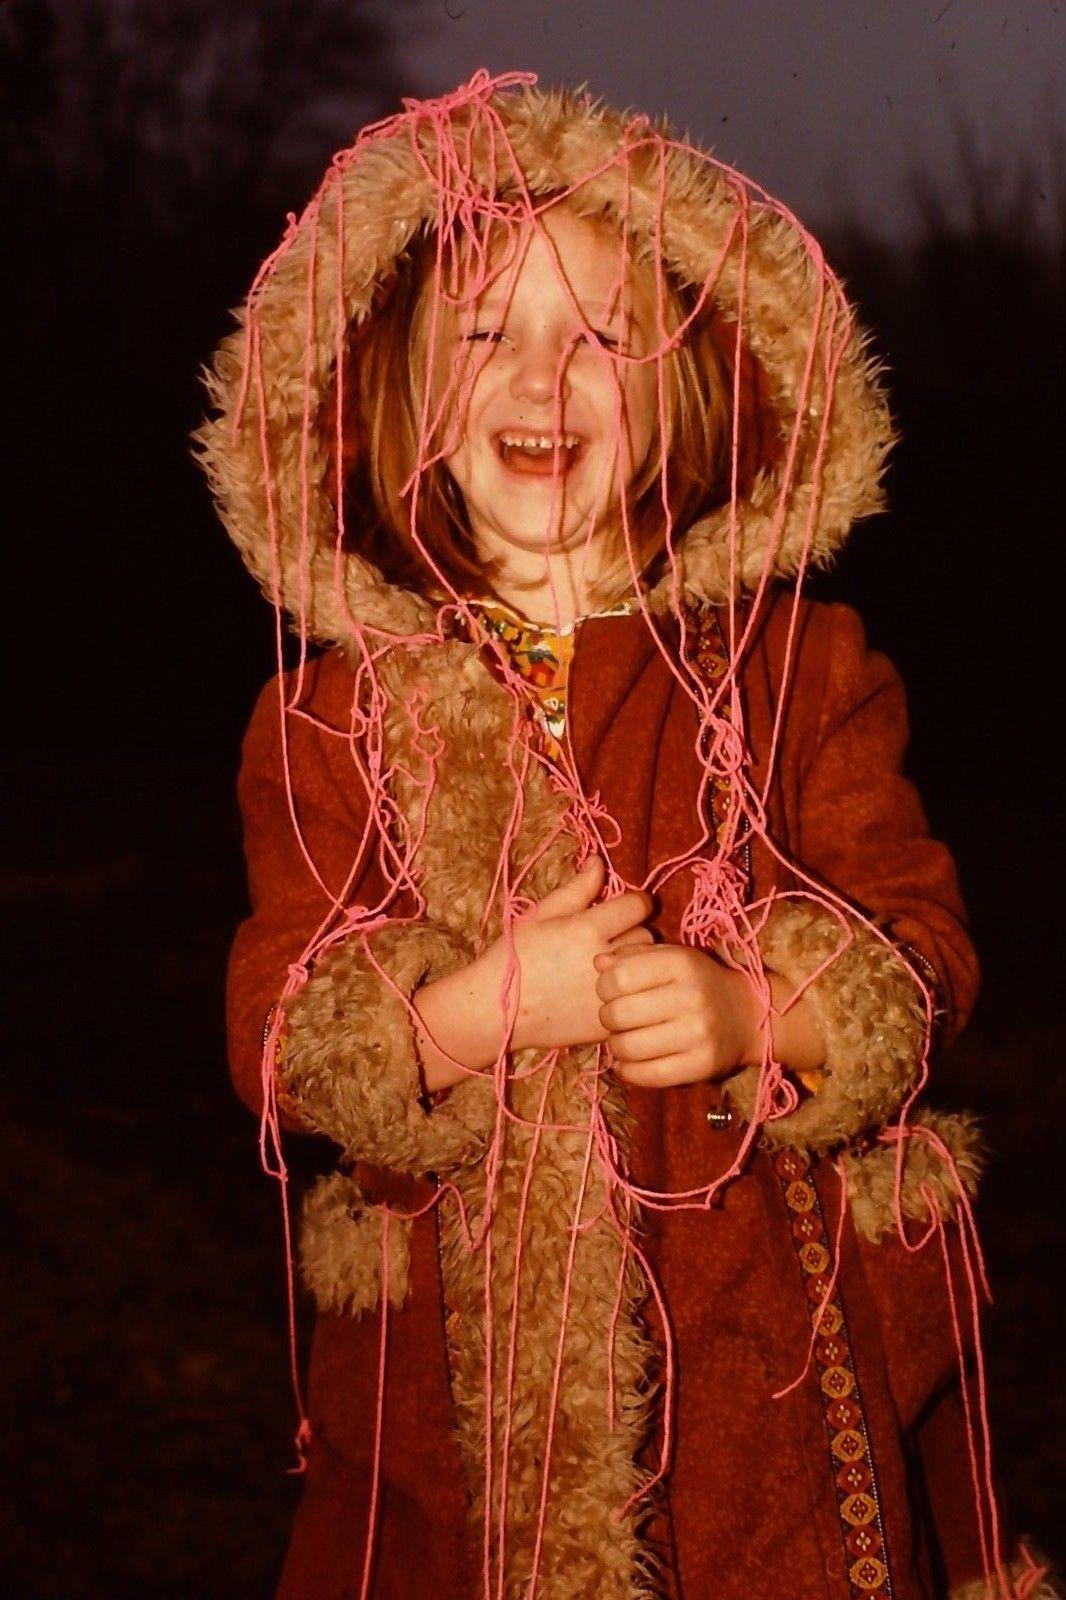 Girl in a winter coat 1970s